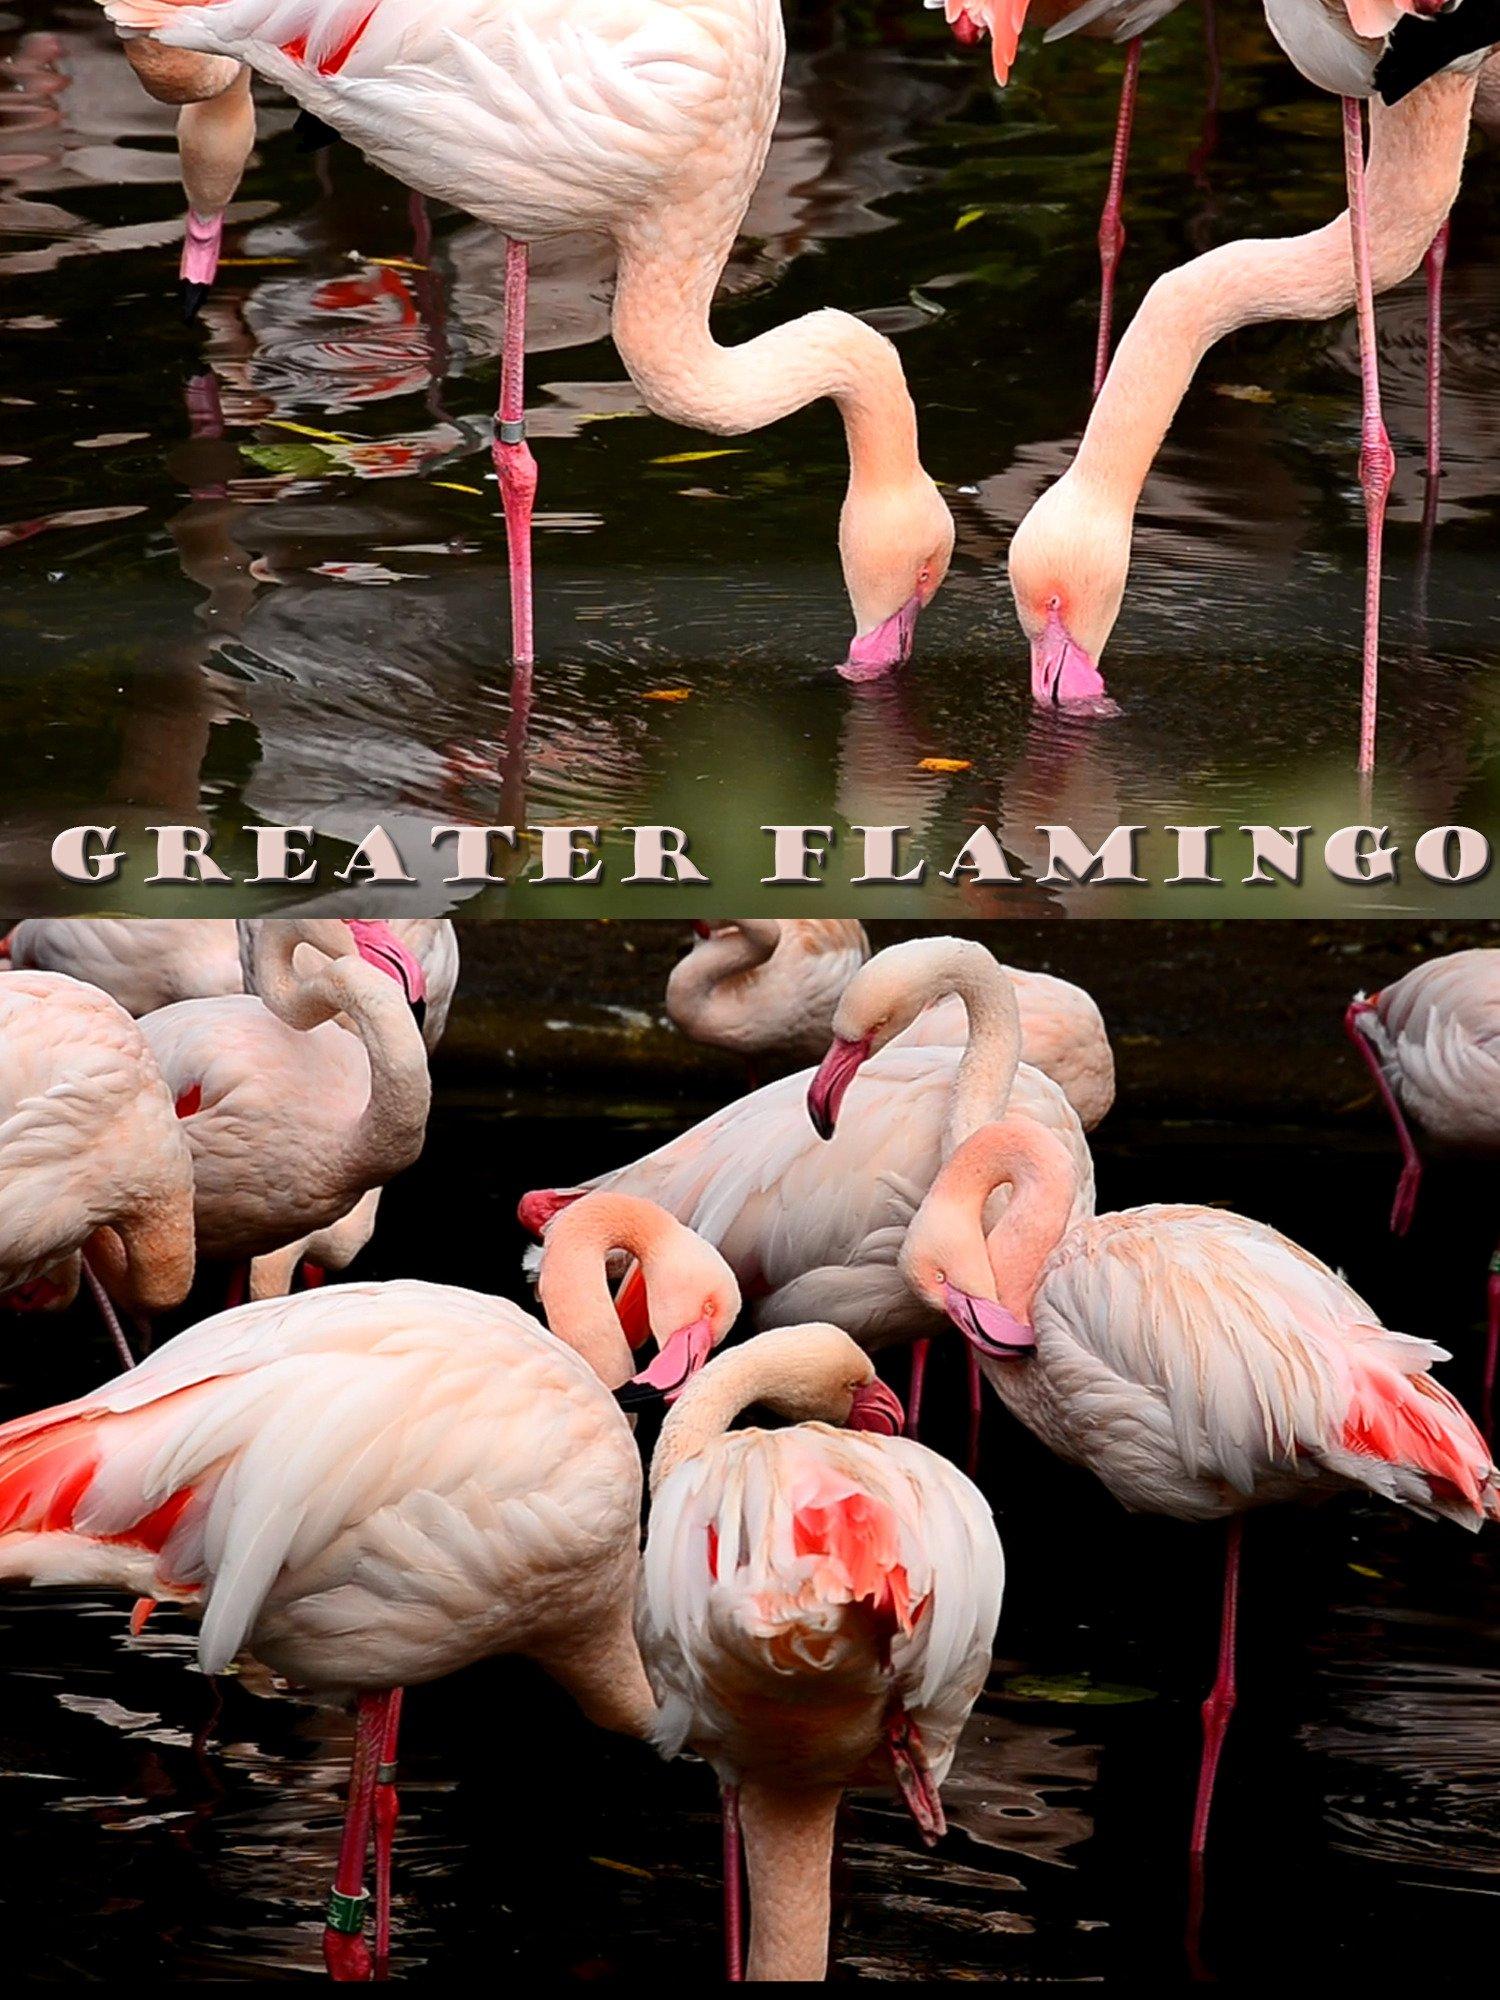 Greater flamingo on Amazon Prime Instant Video UK